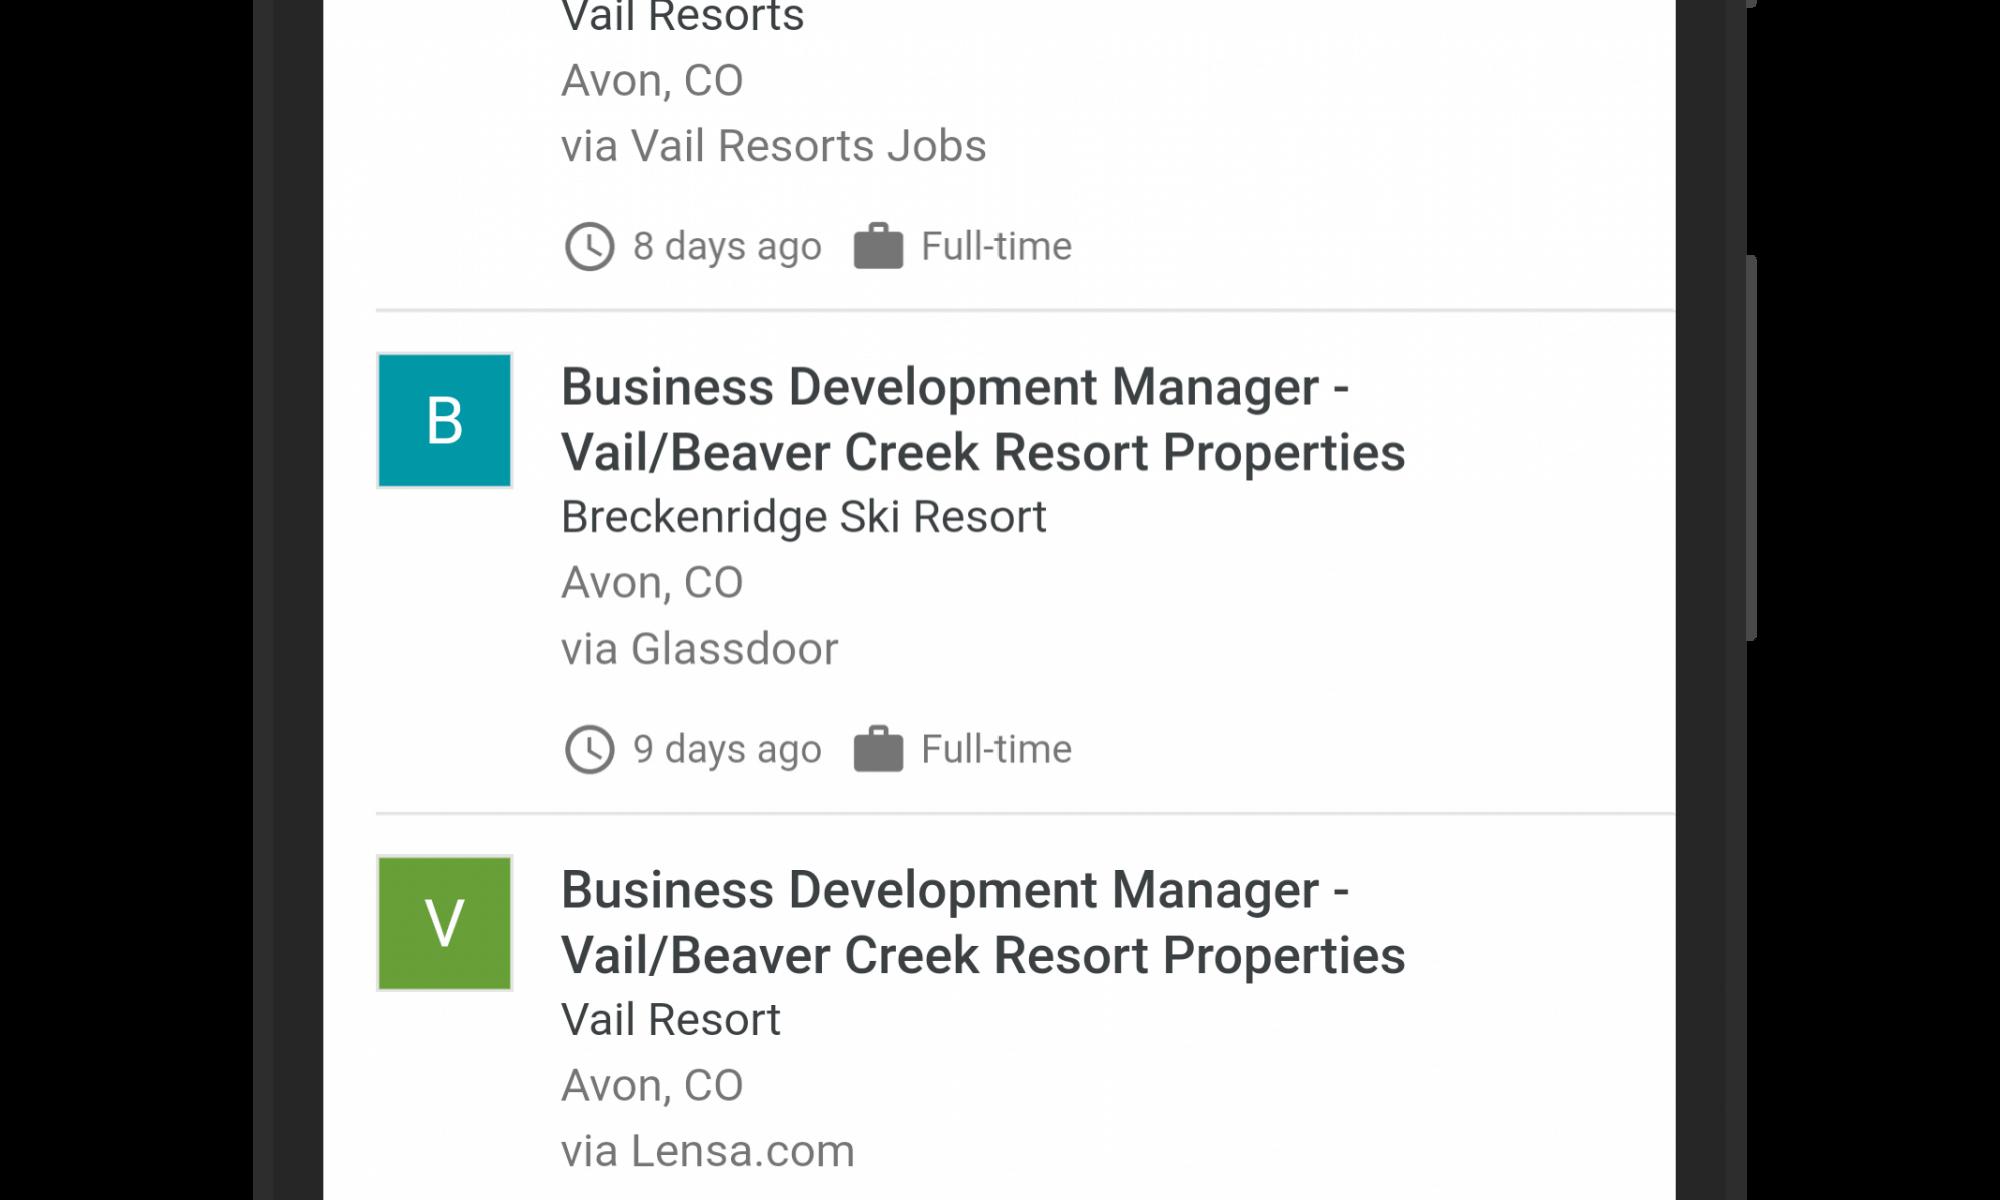 Google Search Job Search Information